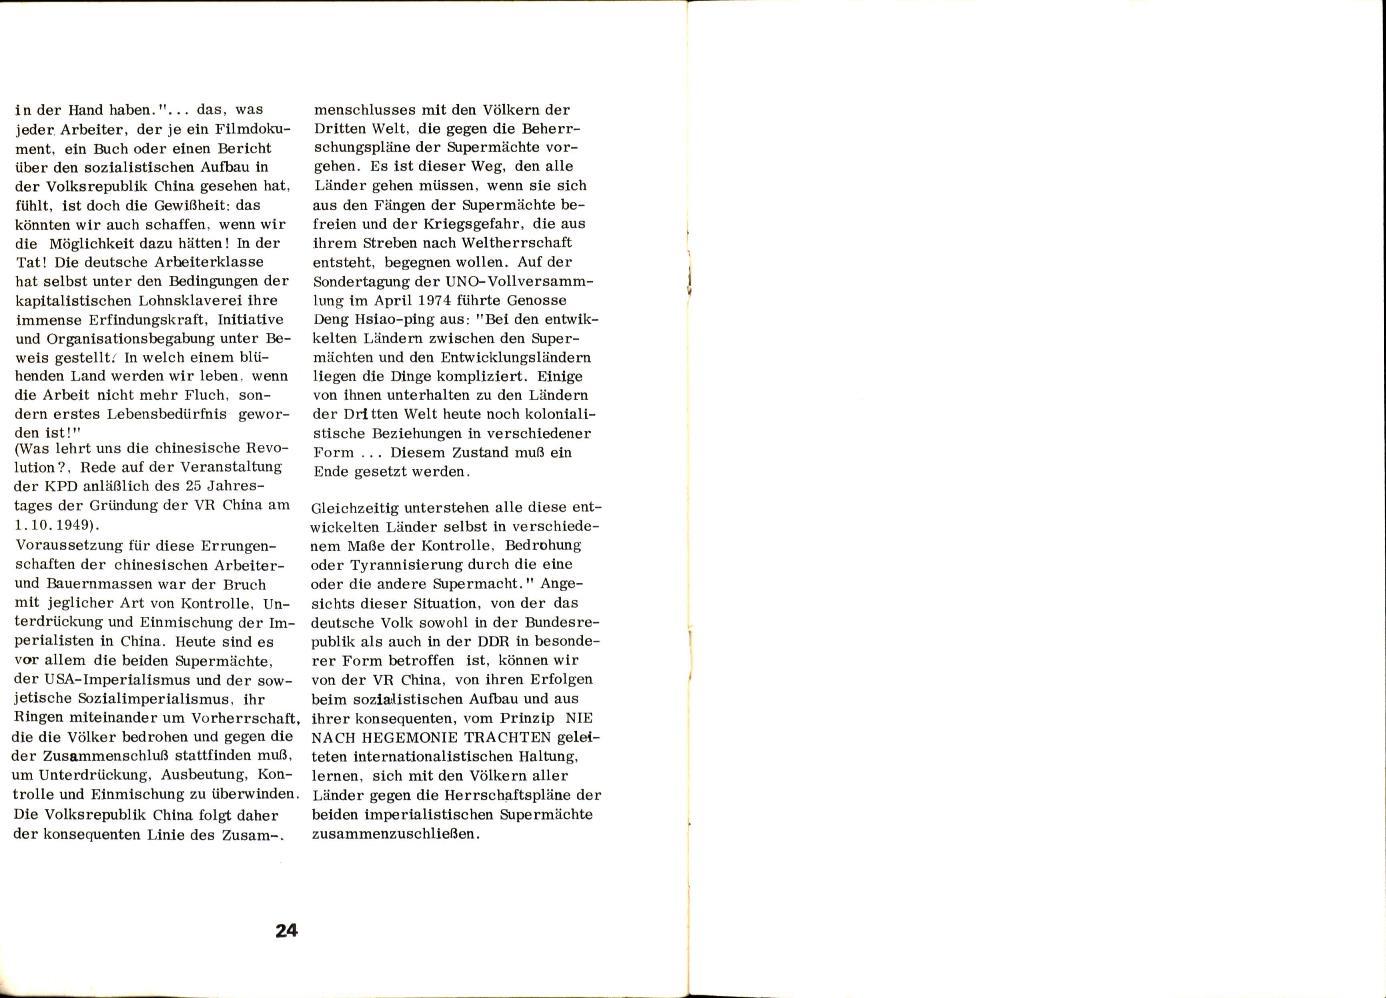 KPDAO_1975_Nationalausstellung_VRCh_in_Koeln_13